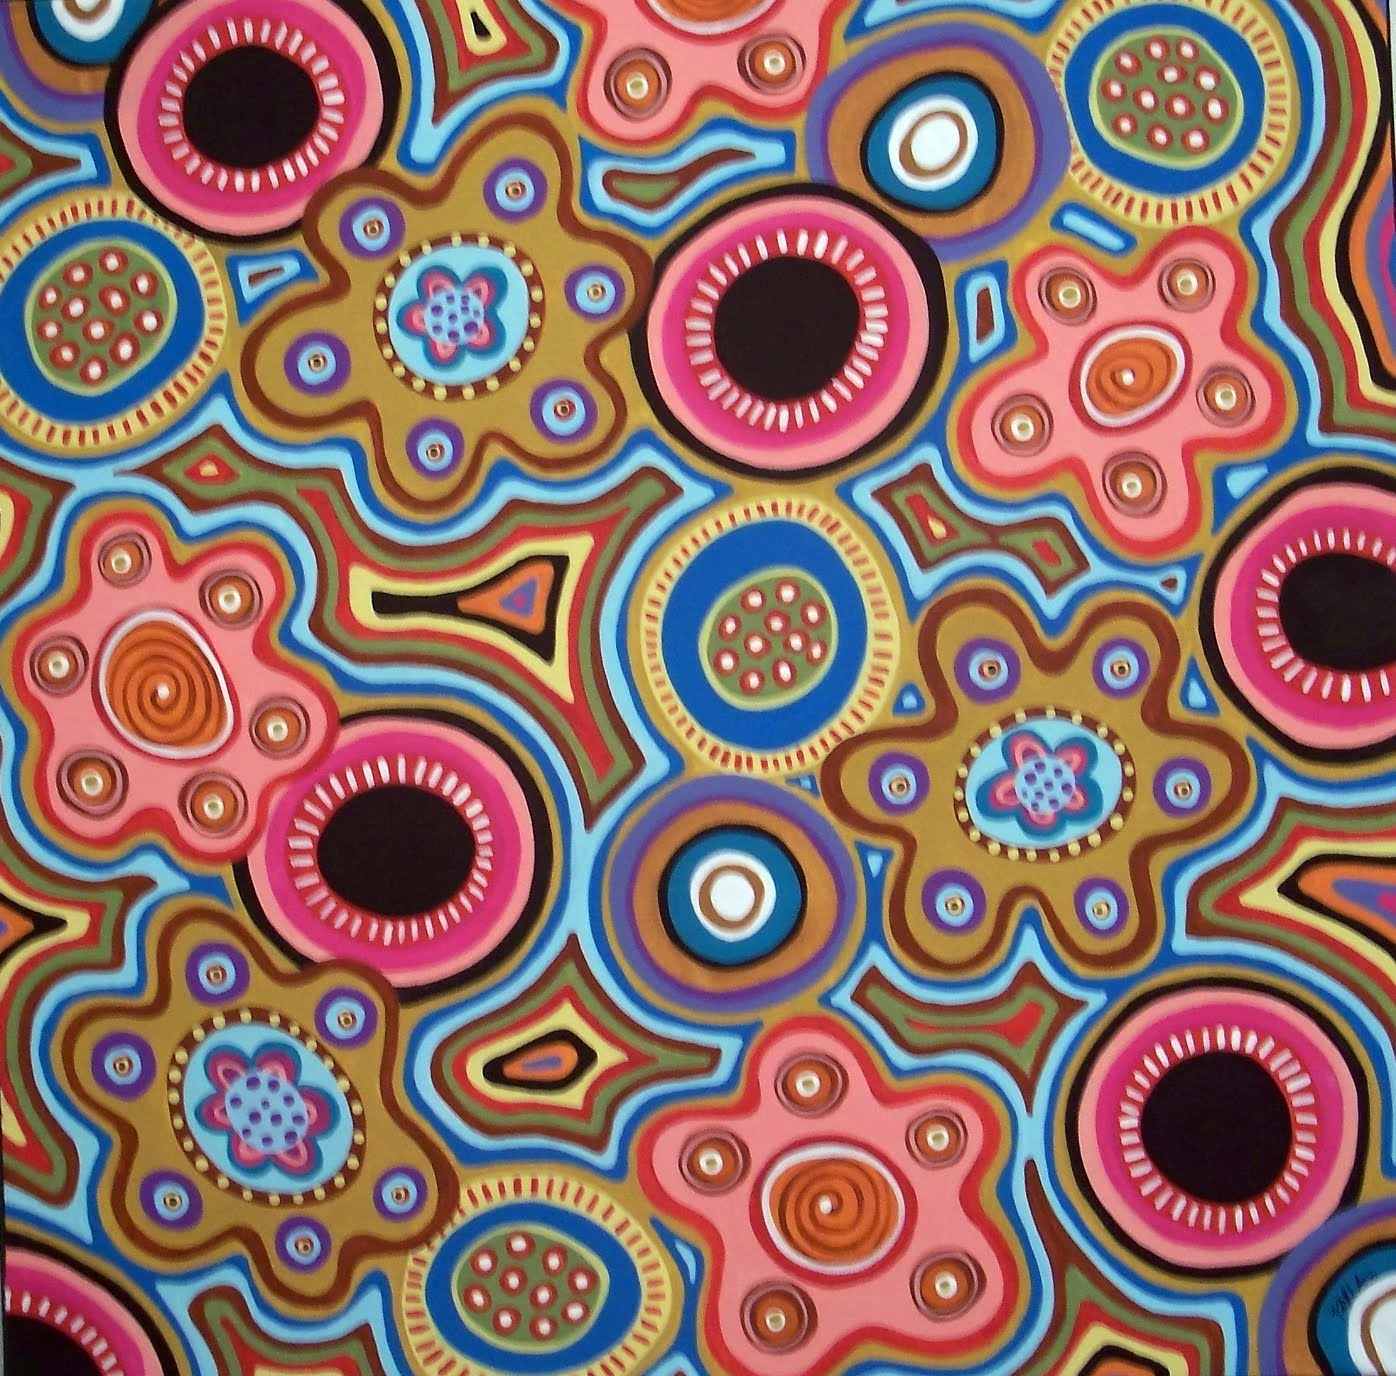 abstract folk art